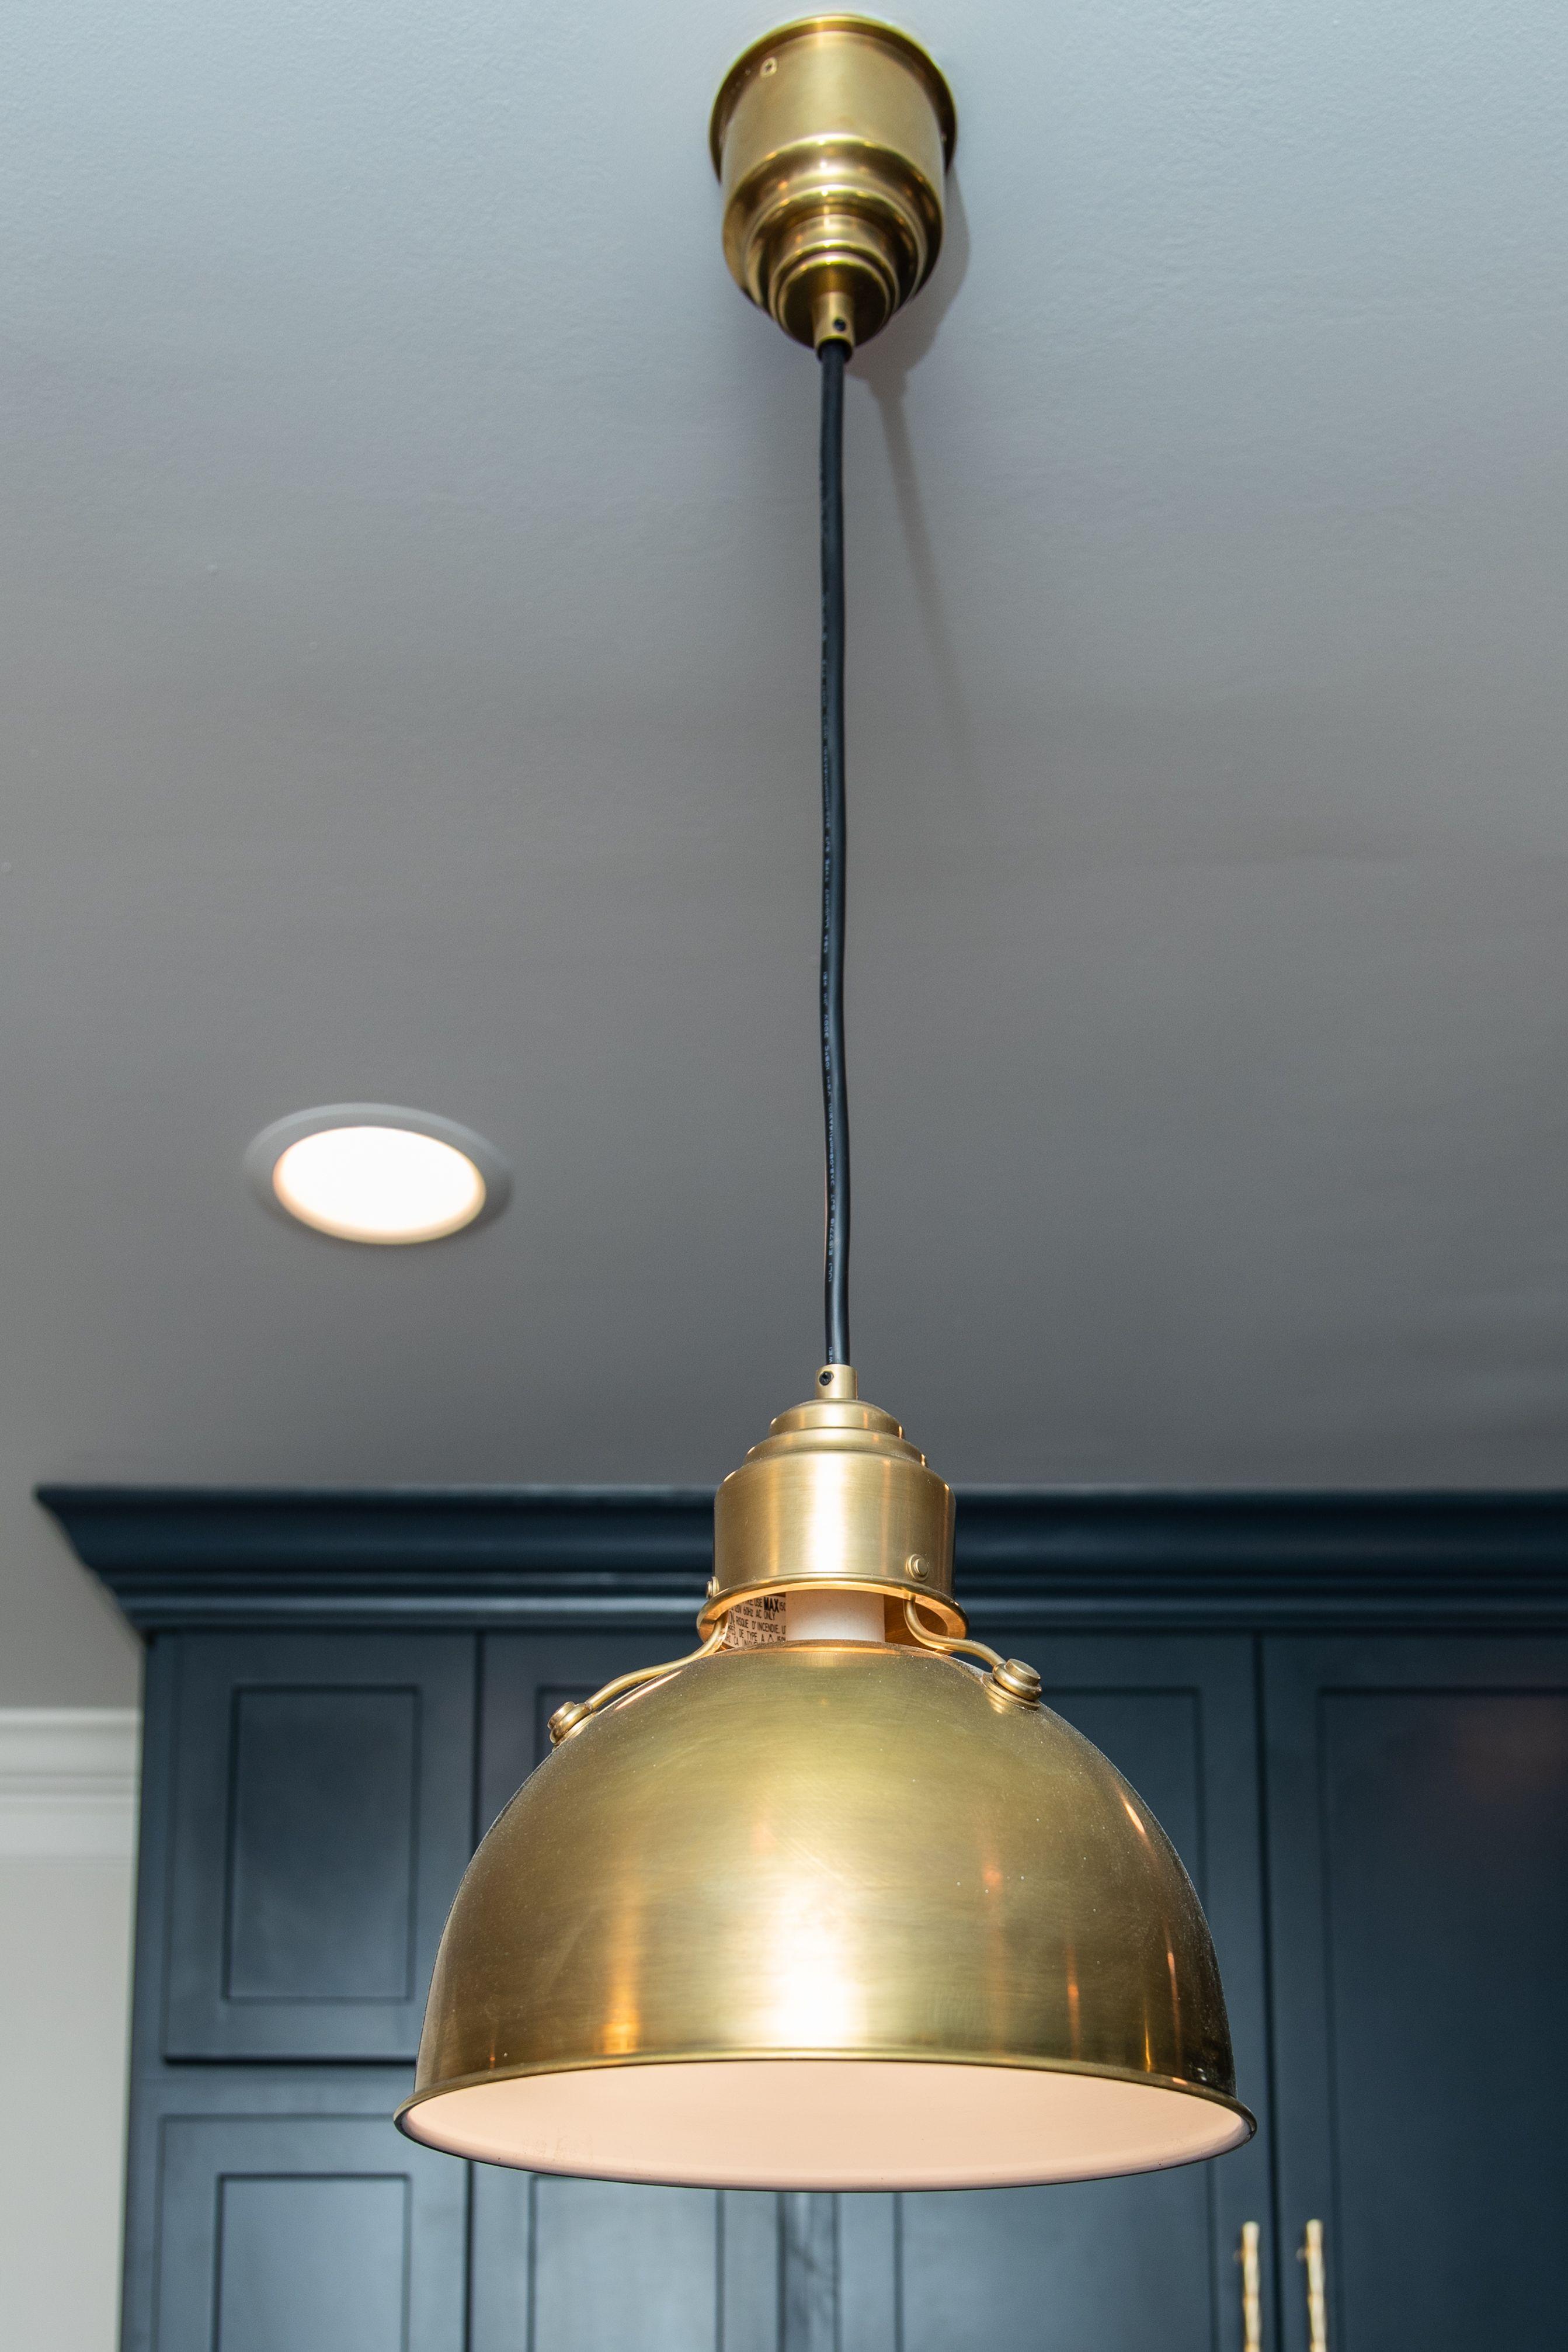 Antique Brass Dome Light Medium Kitchen Sconce Lighting Dome Pendant Lighting Rustic Kitchen Lighting